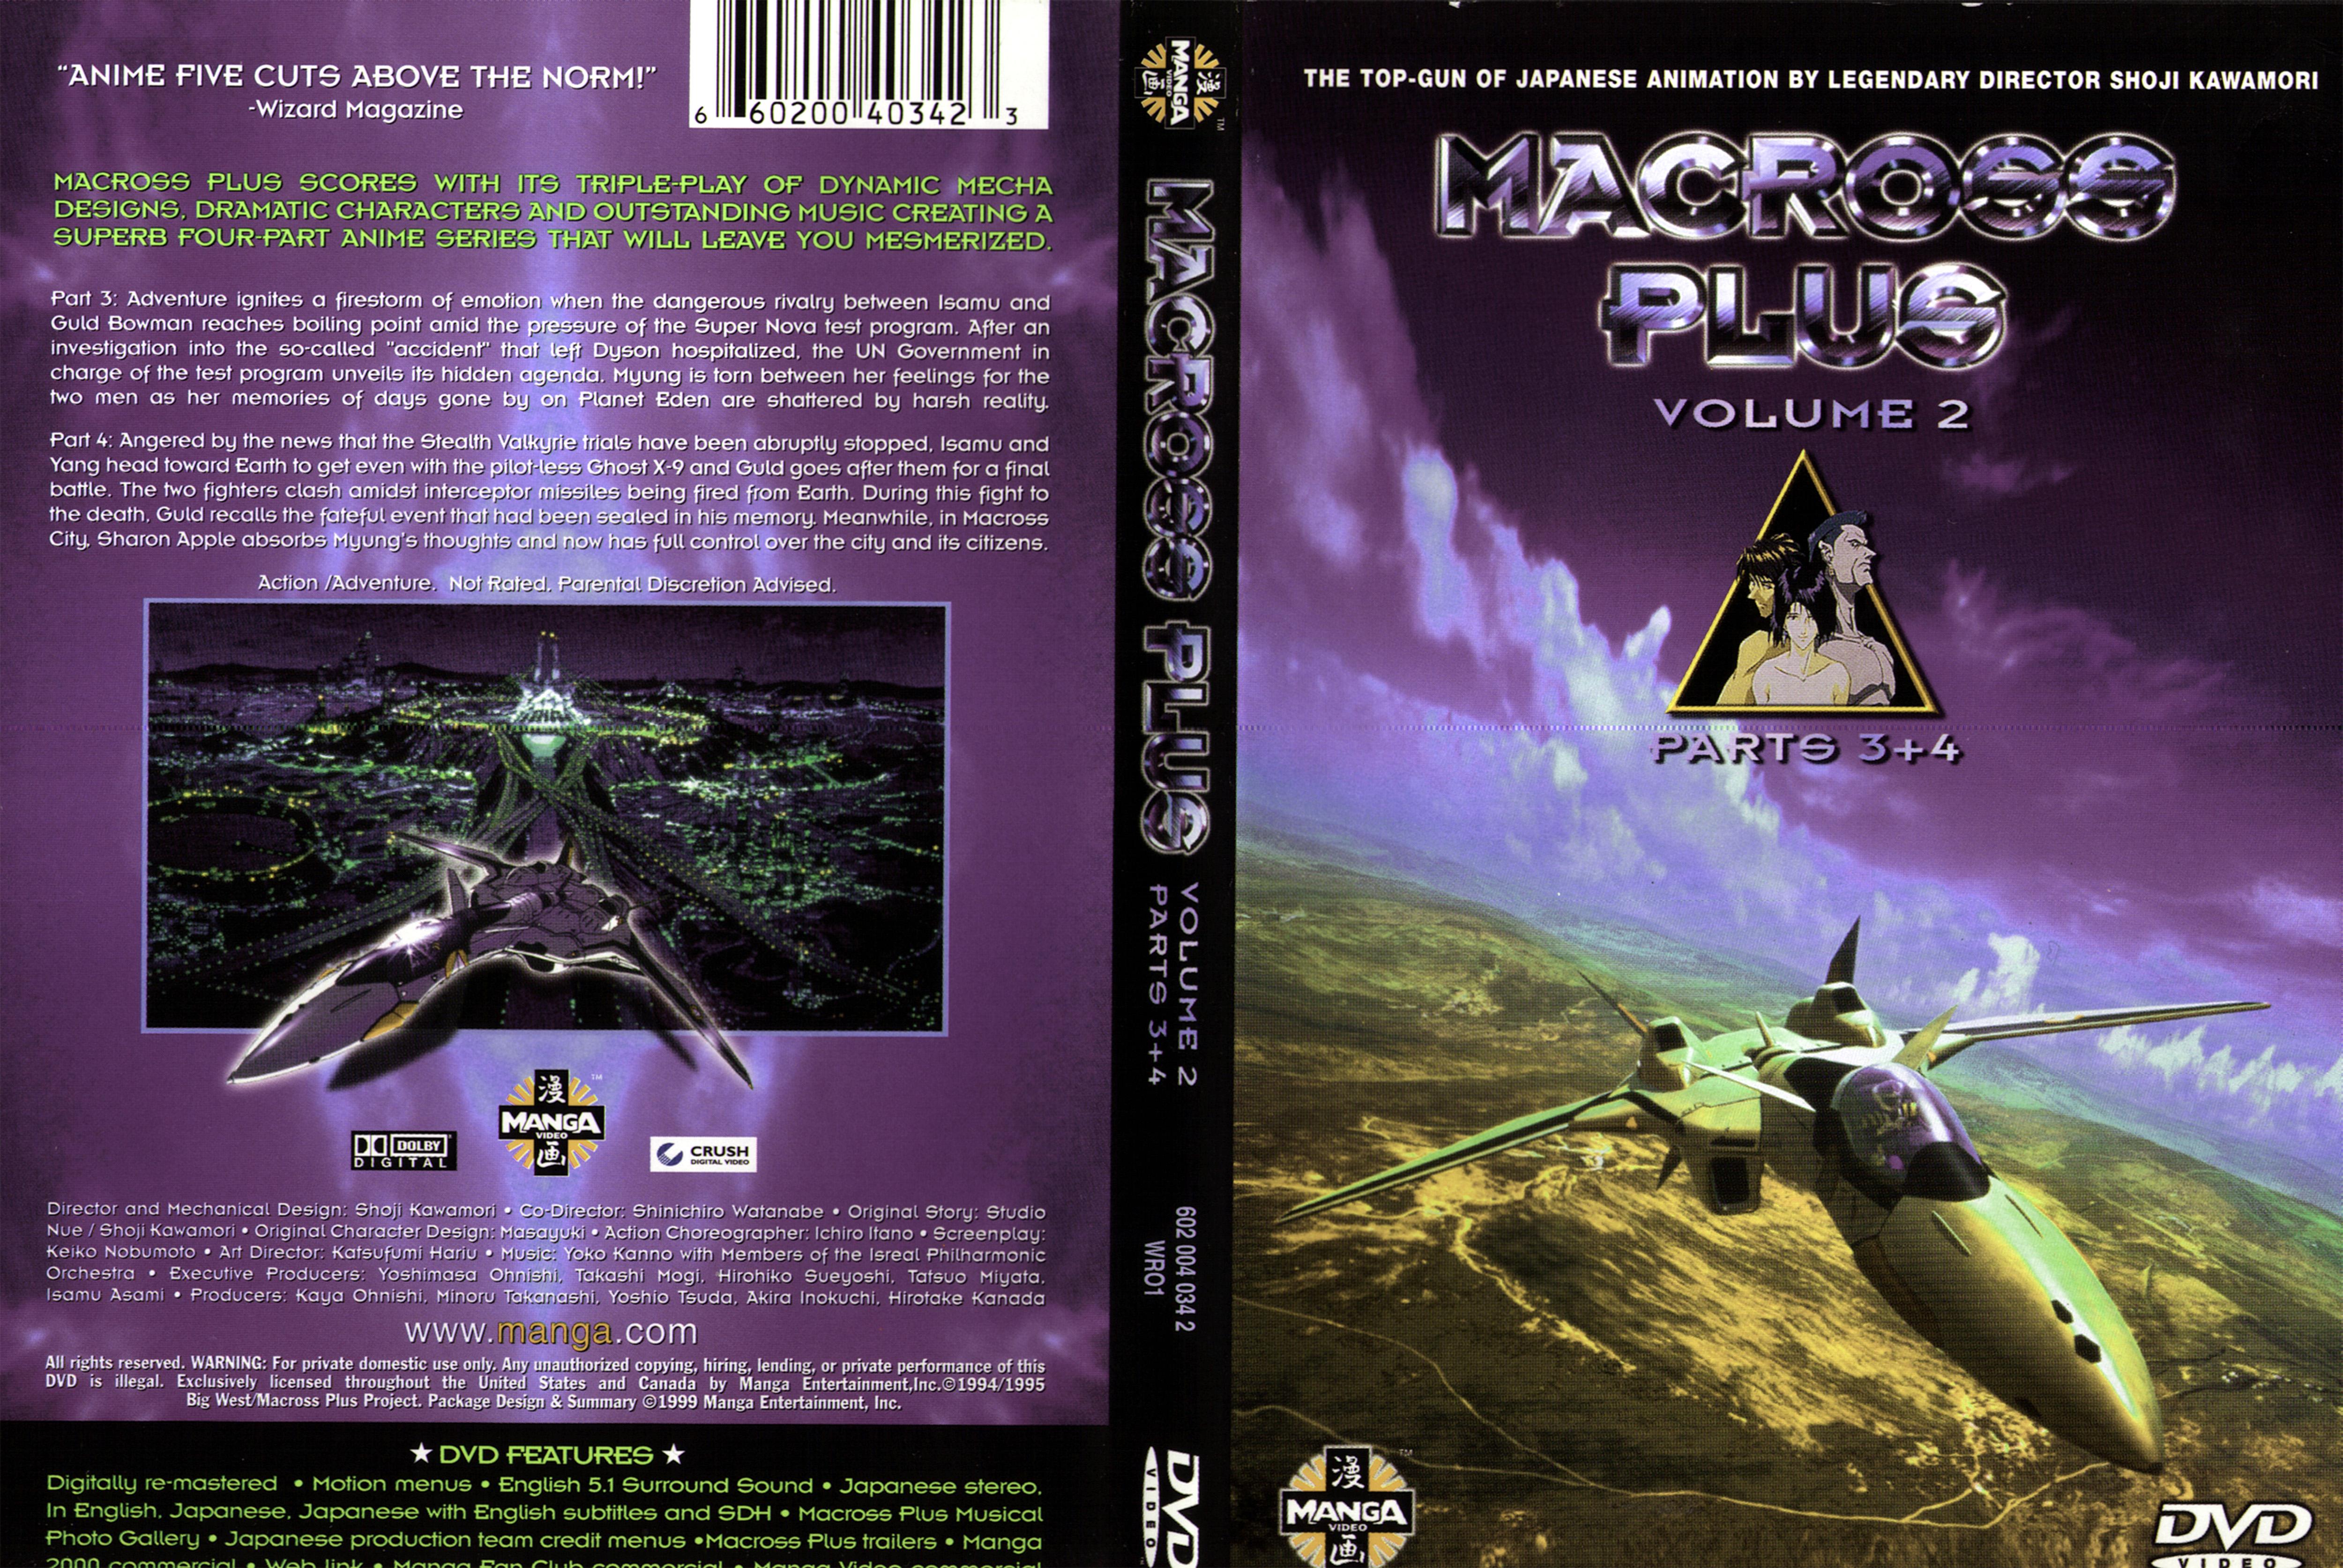 Macross Plus Dvd Macross Dvd Cover